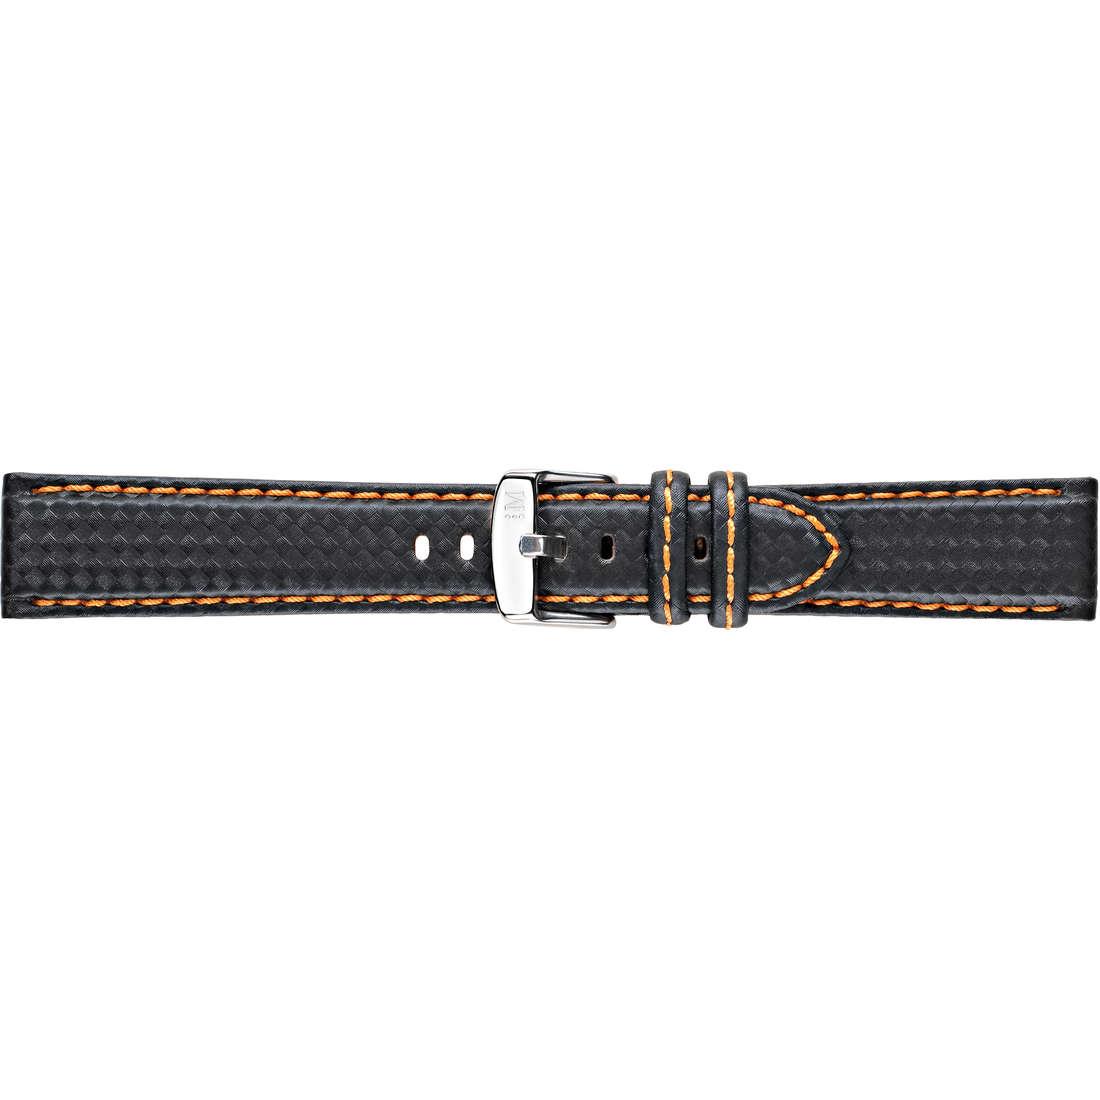 montre bande de montres homme Morellato Linea Sport A01U3586977886CR22